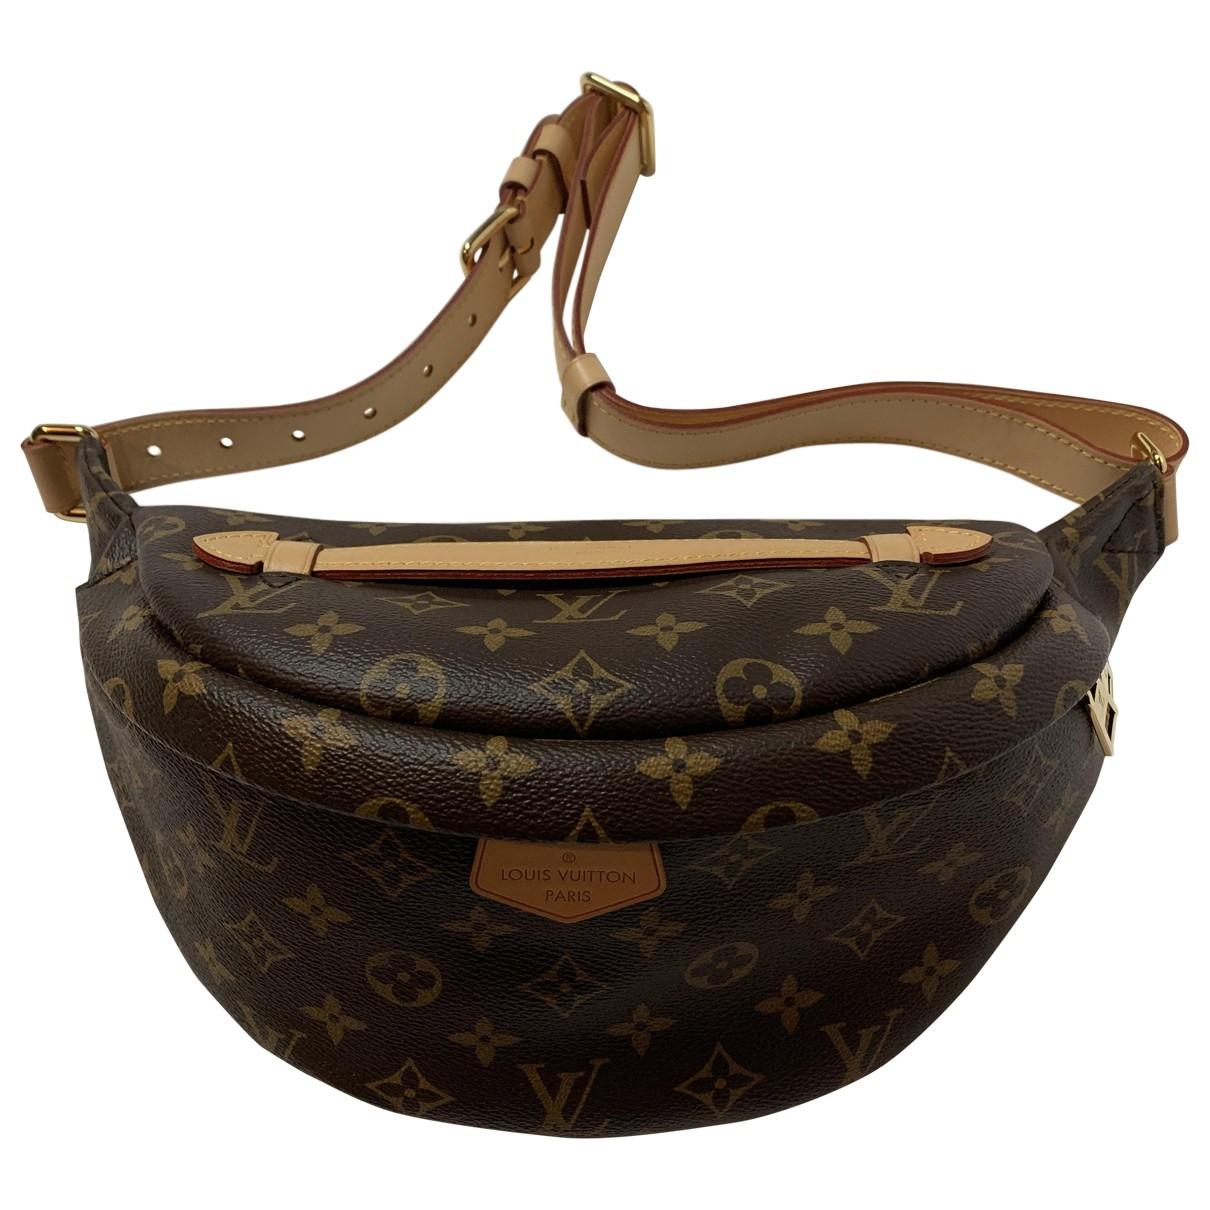 Louis Vuitton Bum Bag / Sac Ceinture Clutch in  Braun Leinen